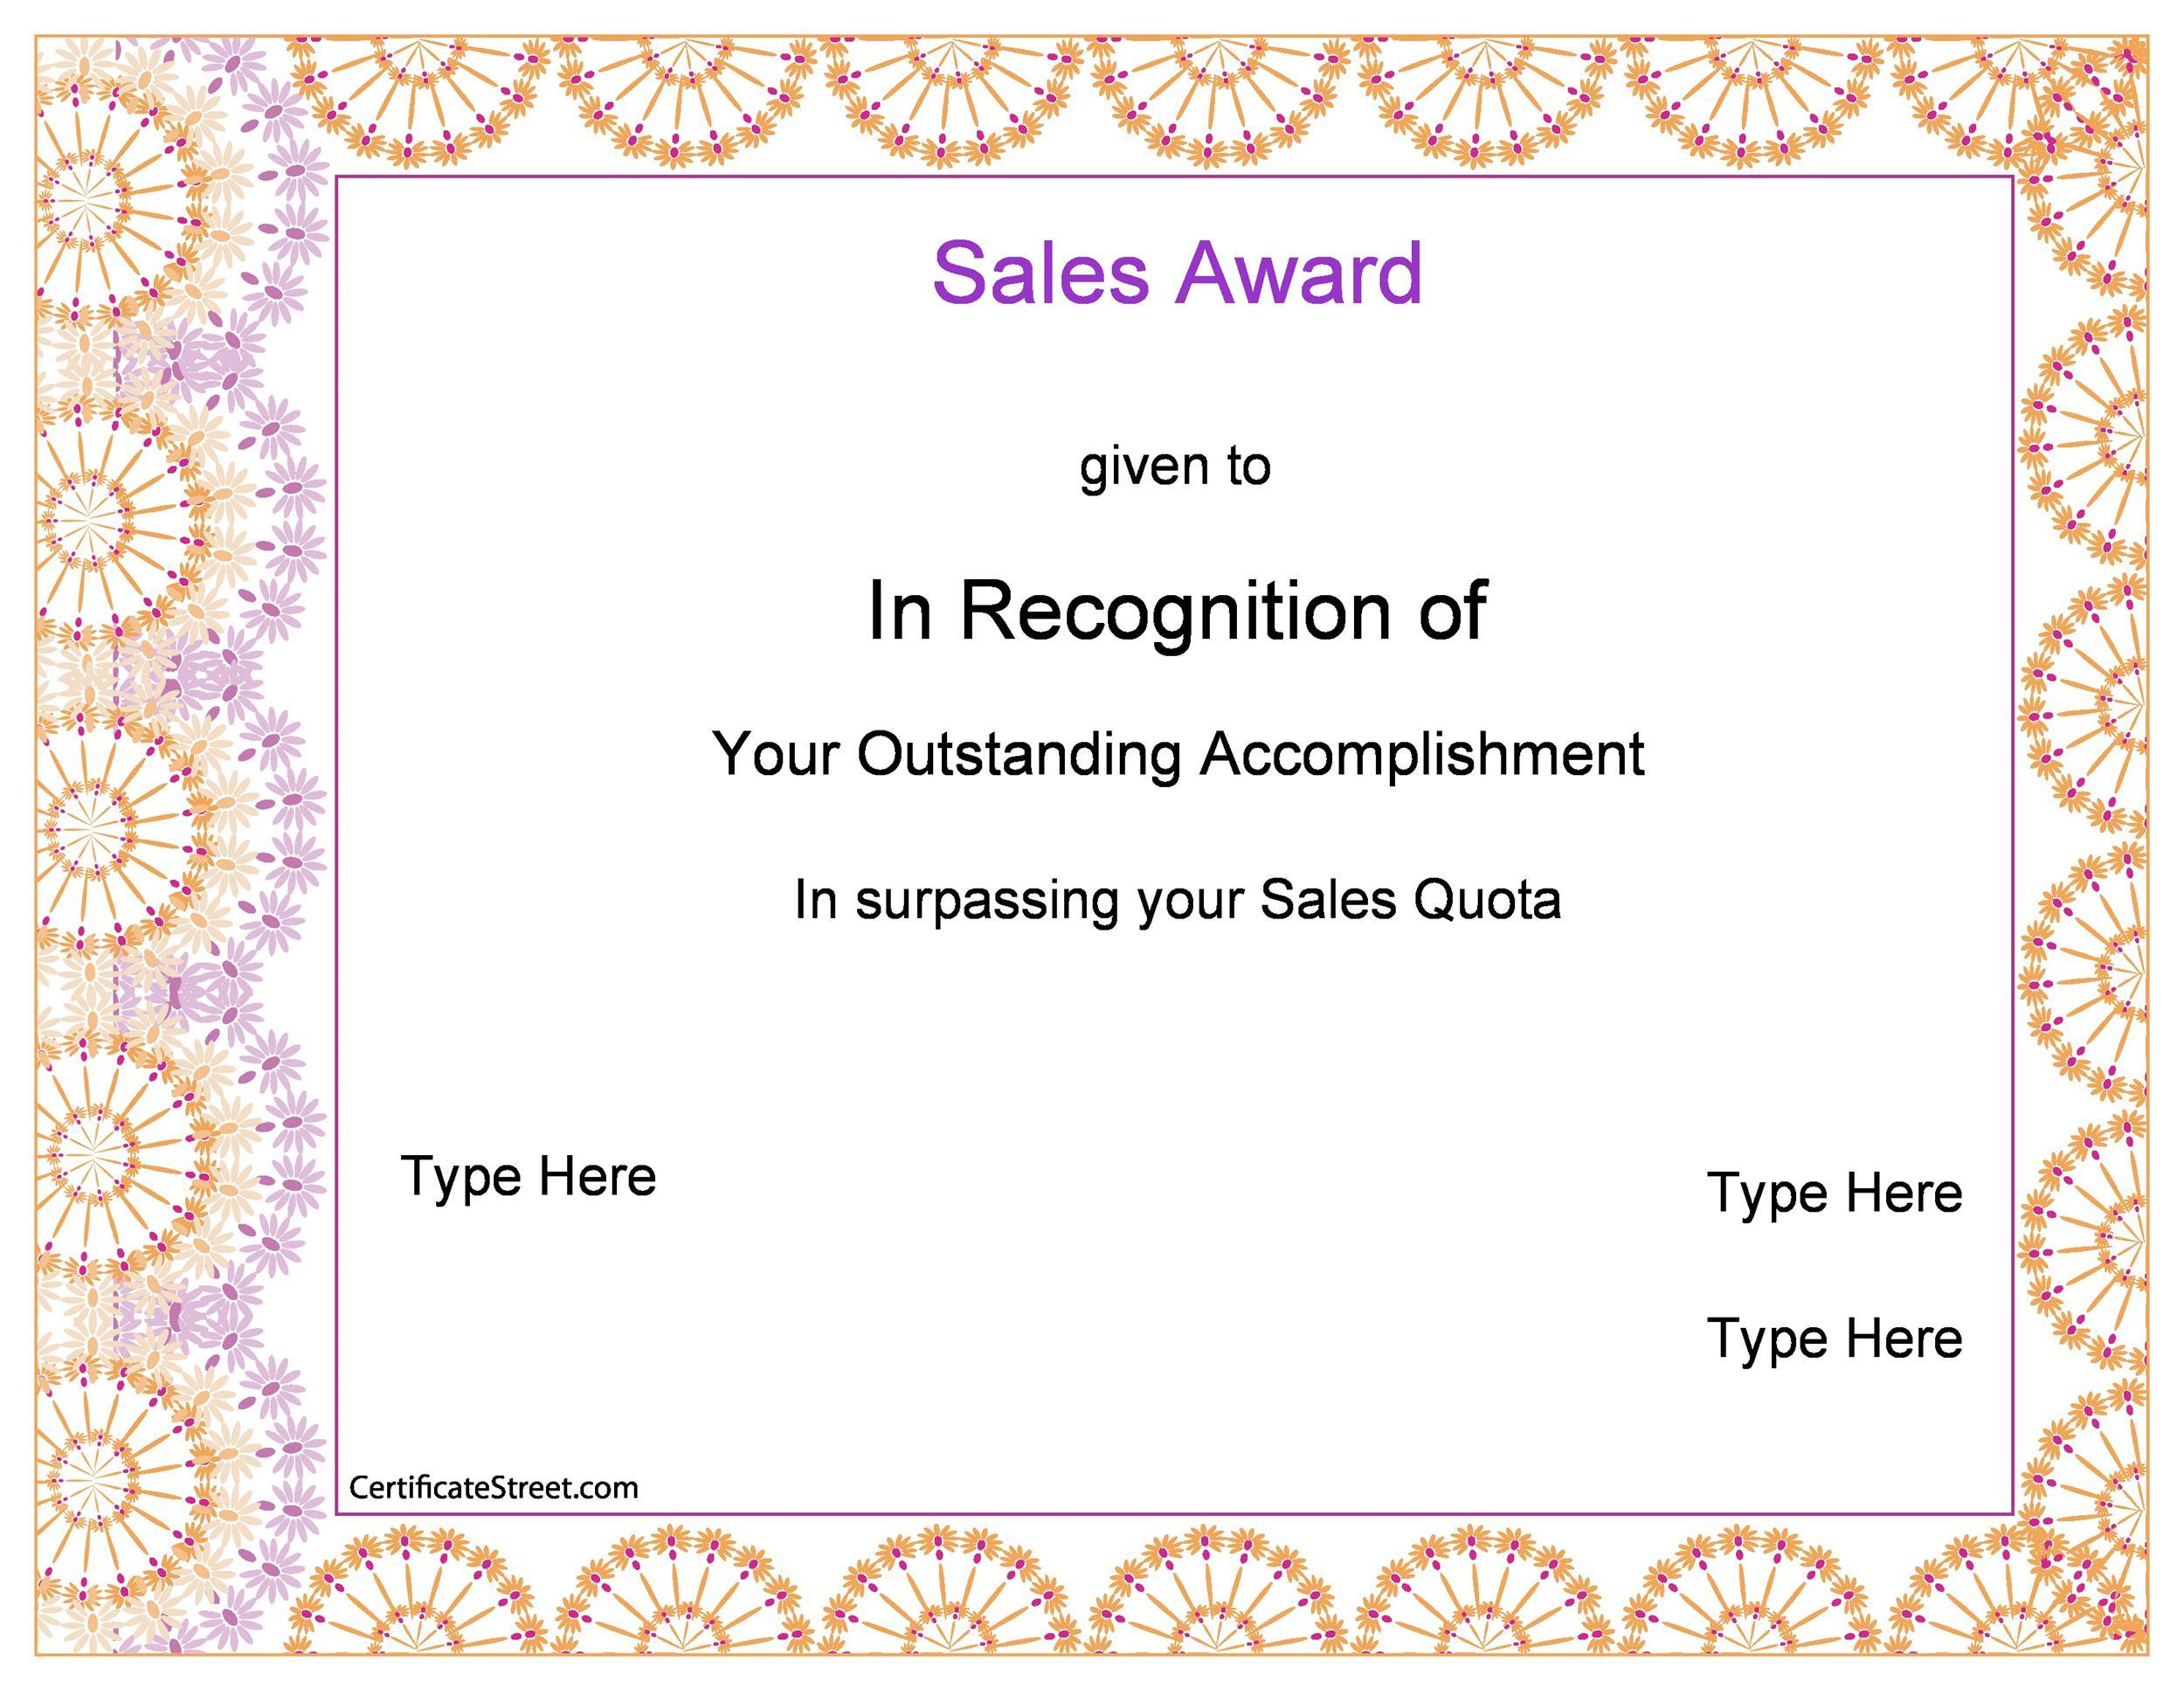 50 Amazing Award Certificate Templates Template Lab – Certificate Award Template